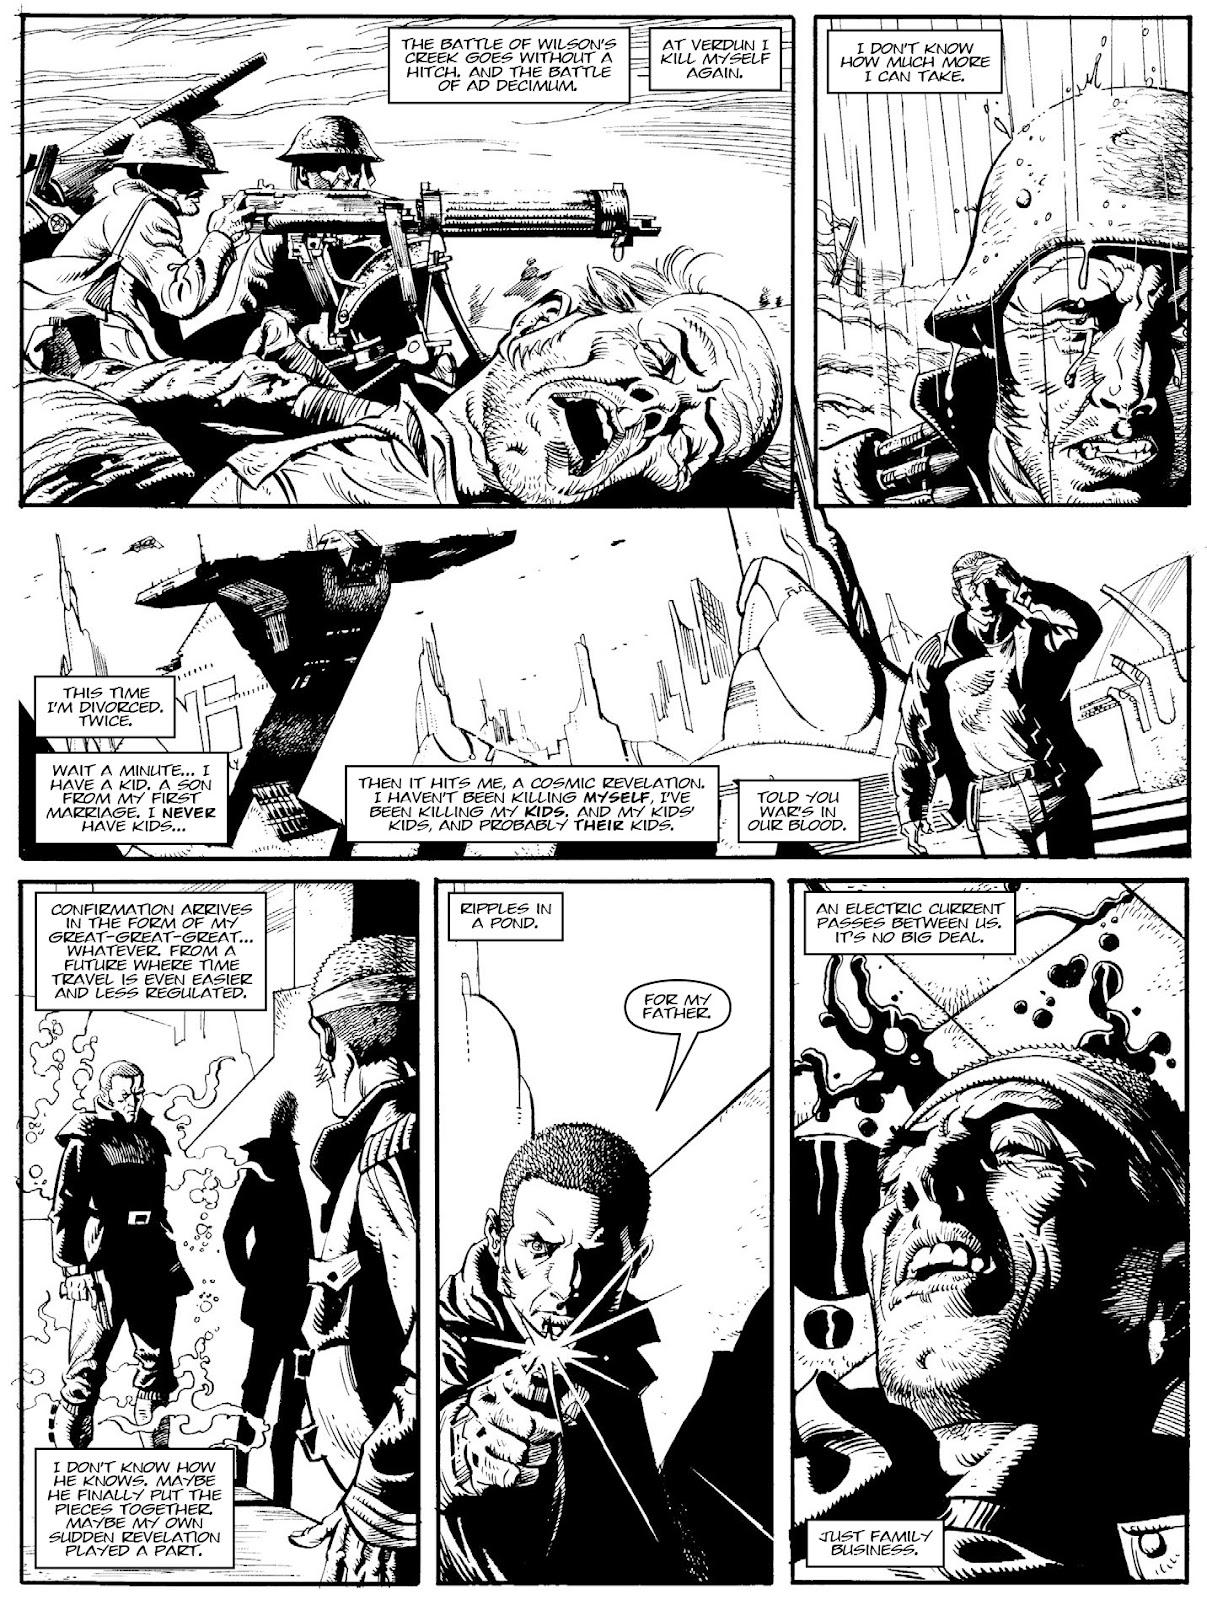 Judge Dredd Megazine (Vol. 5) issue 427 - Page 113